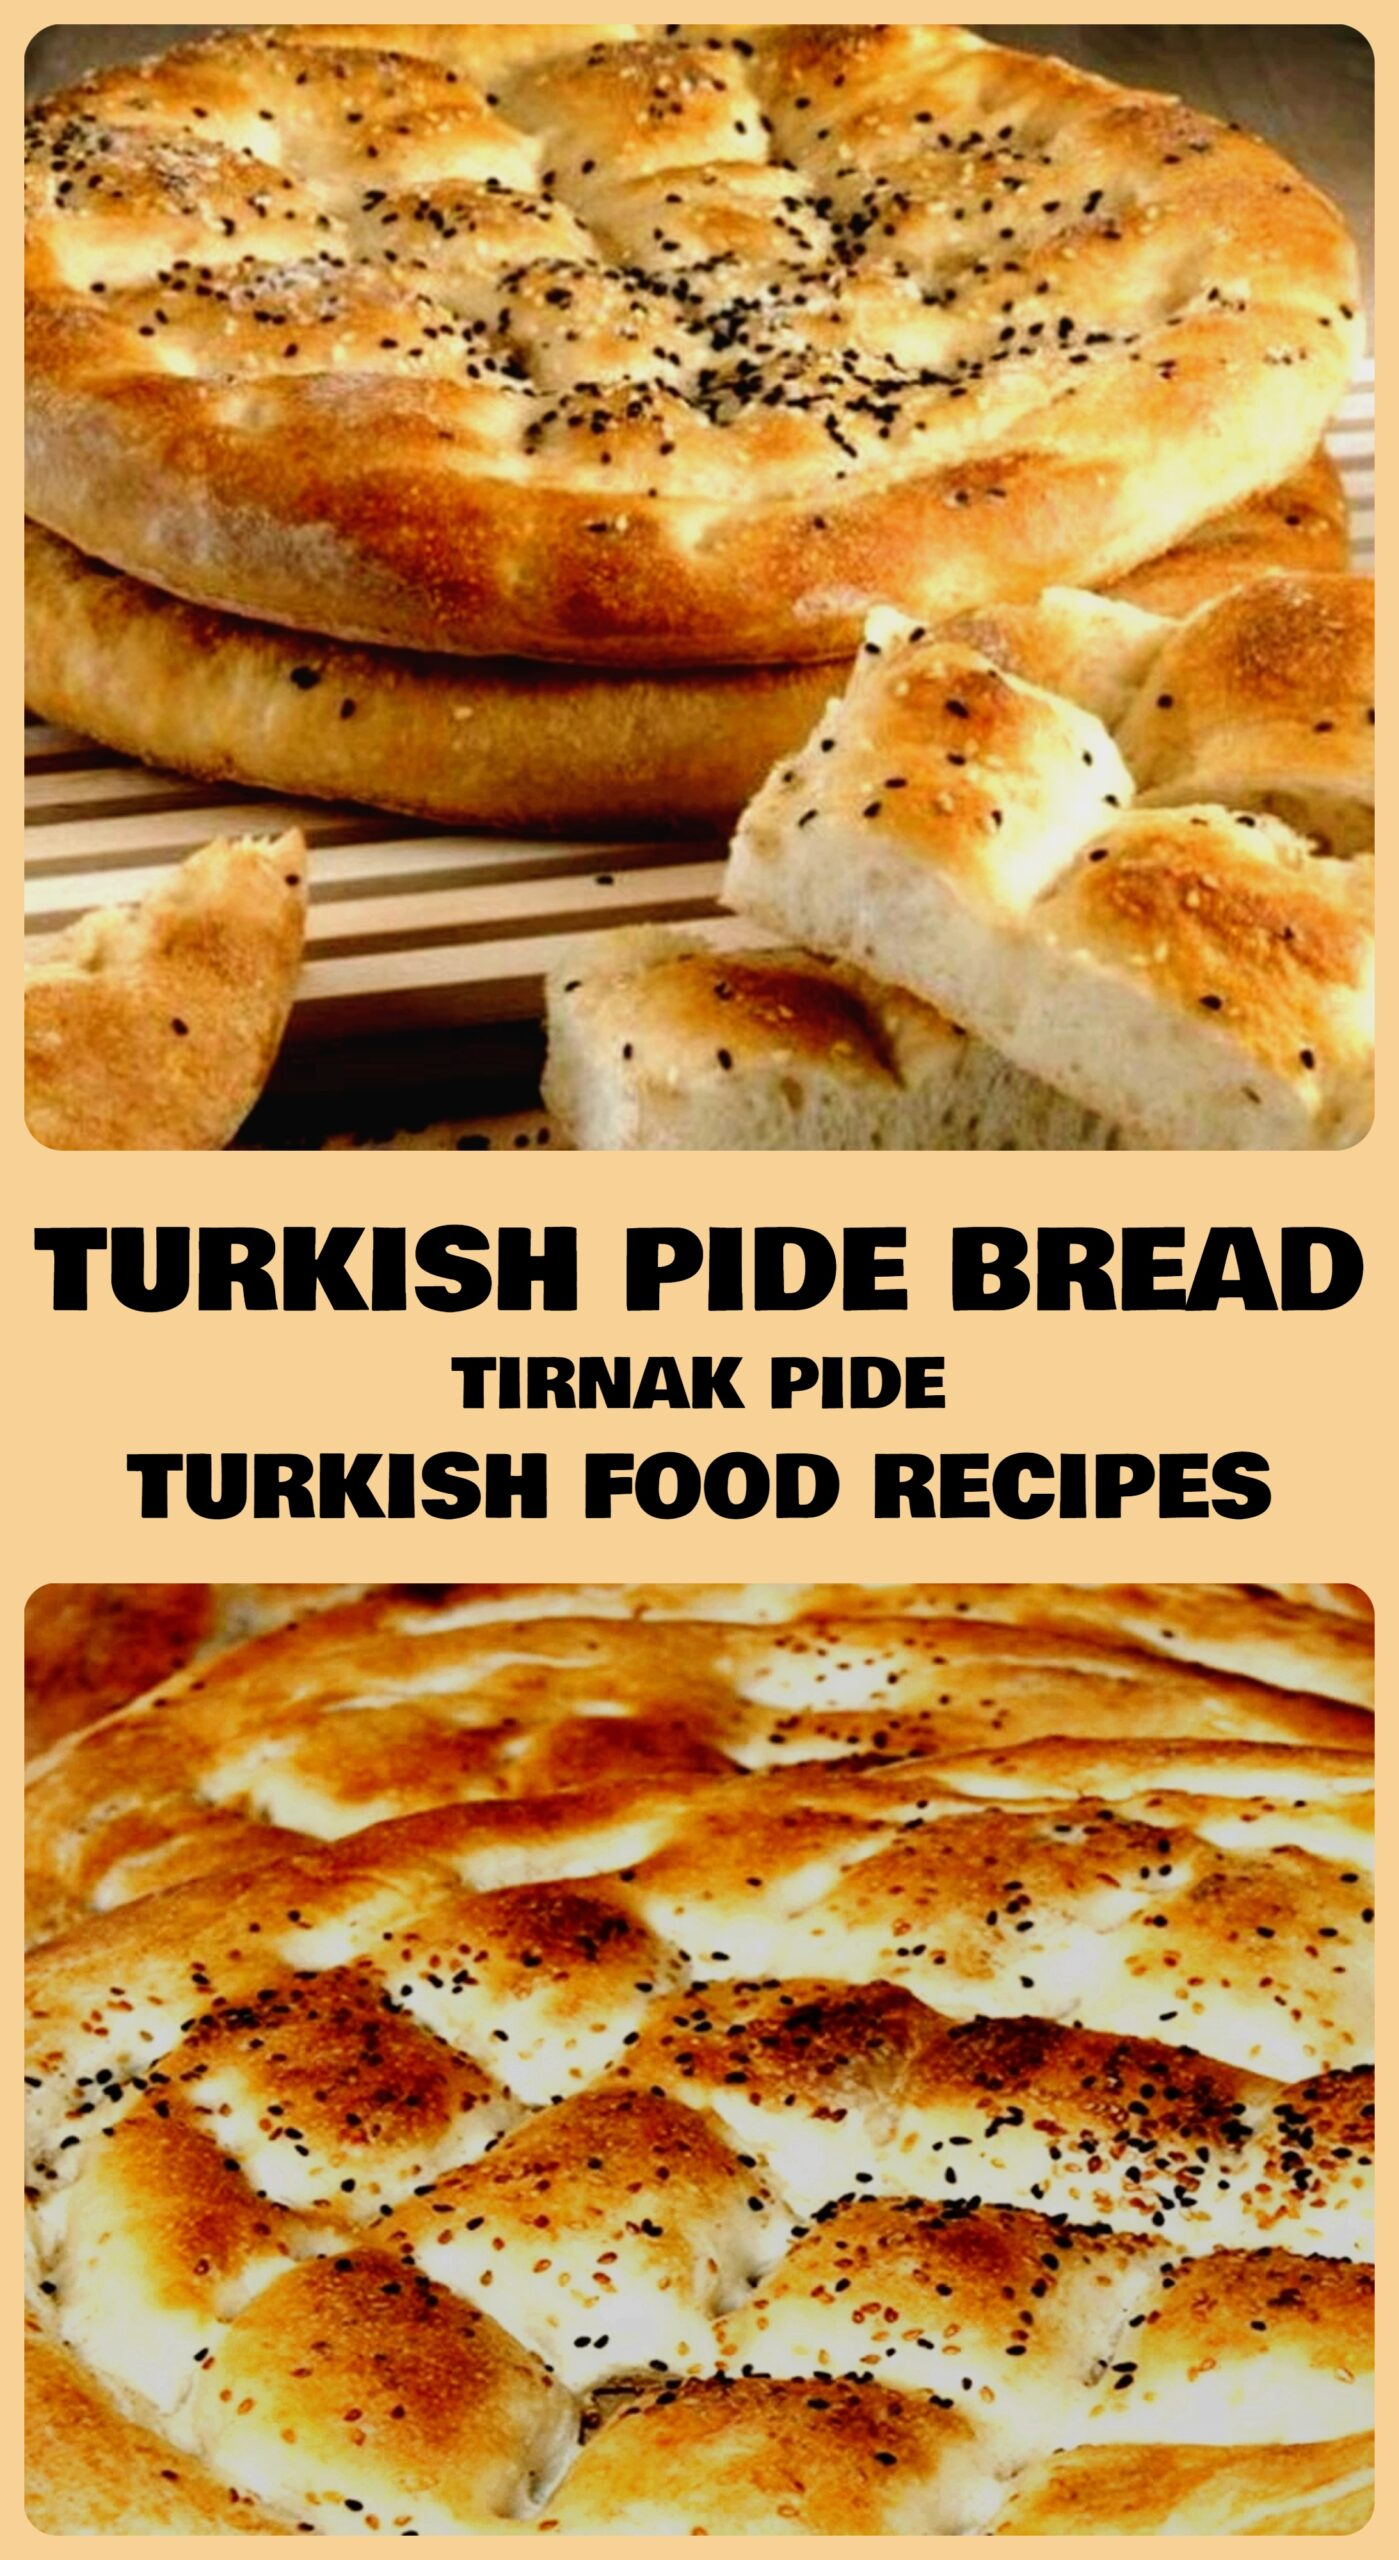 Turkish Pide Bread - Tirnak Pide Recipe